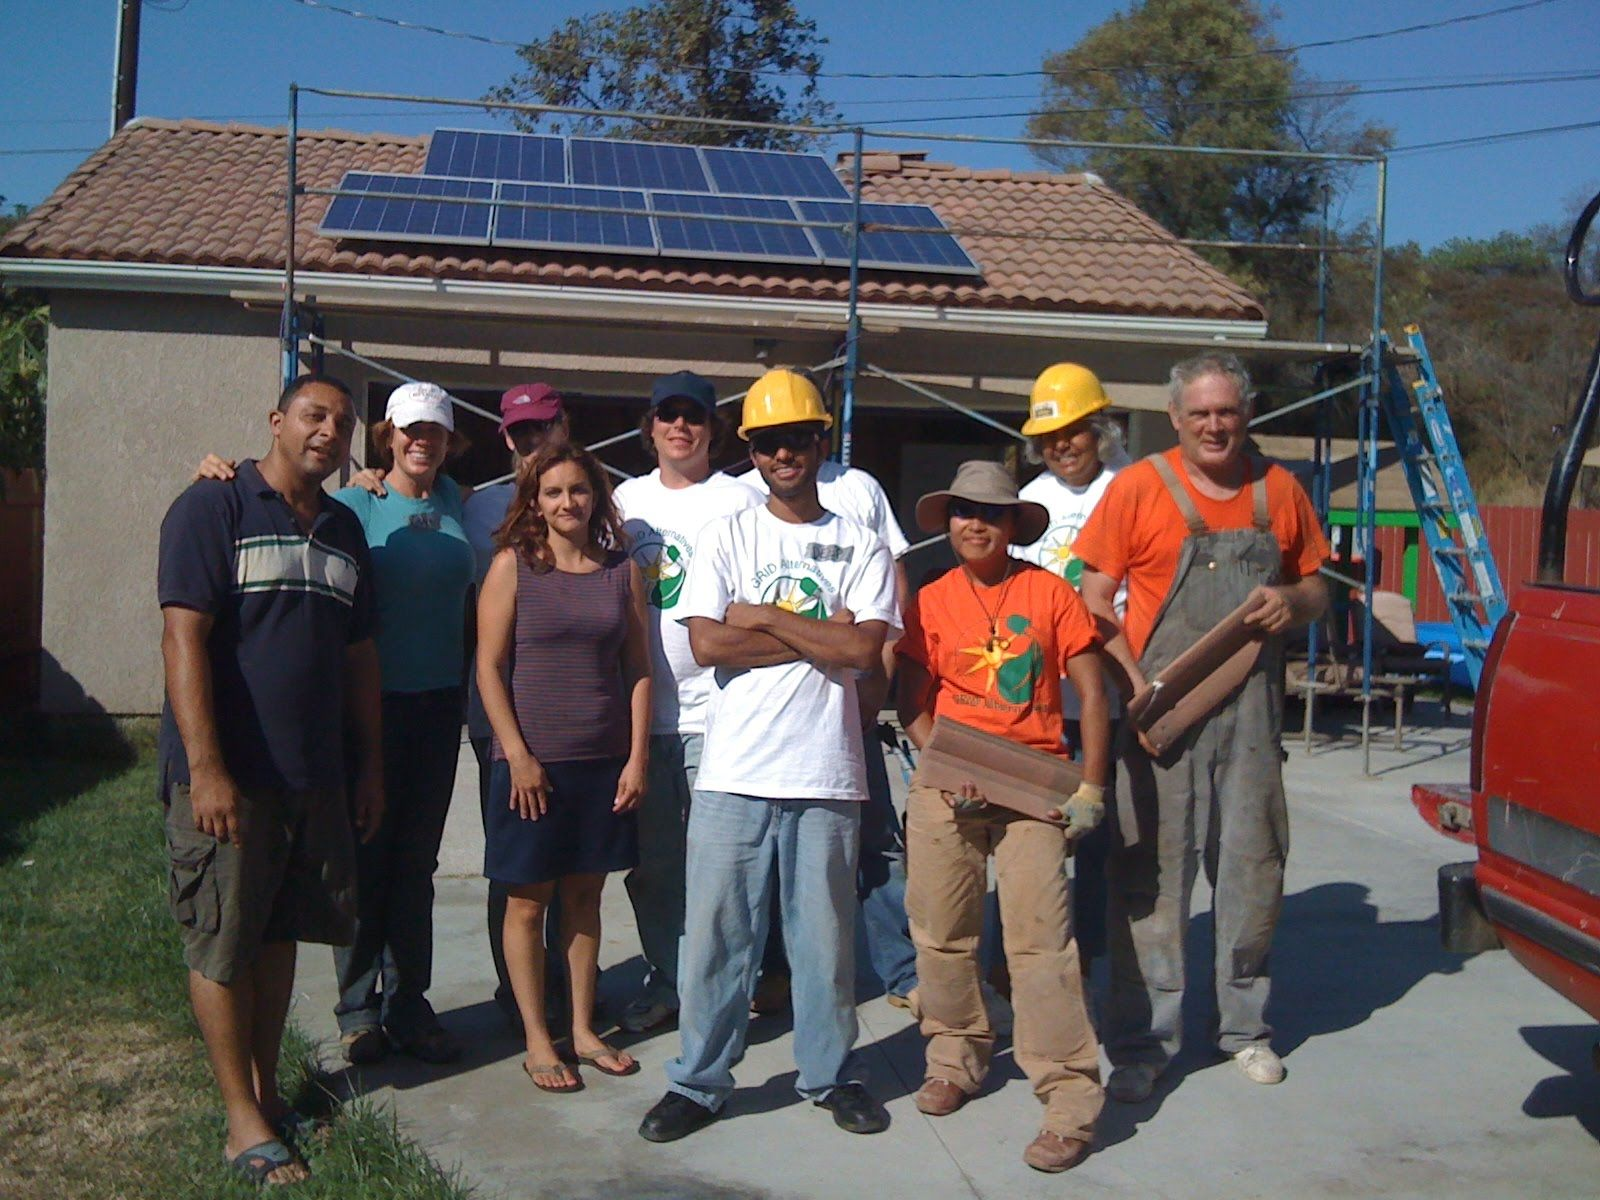 solar panels + grid alternatives = fun